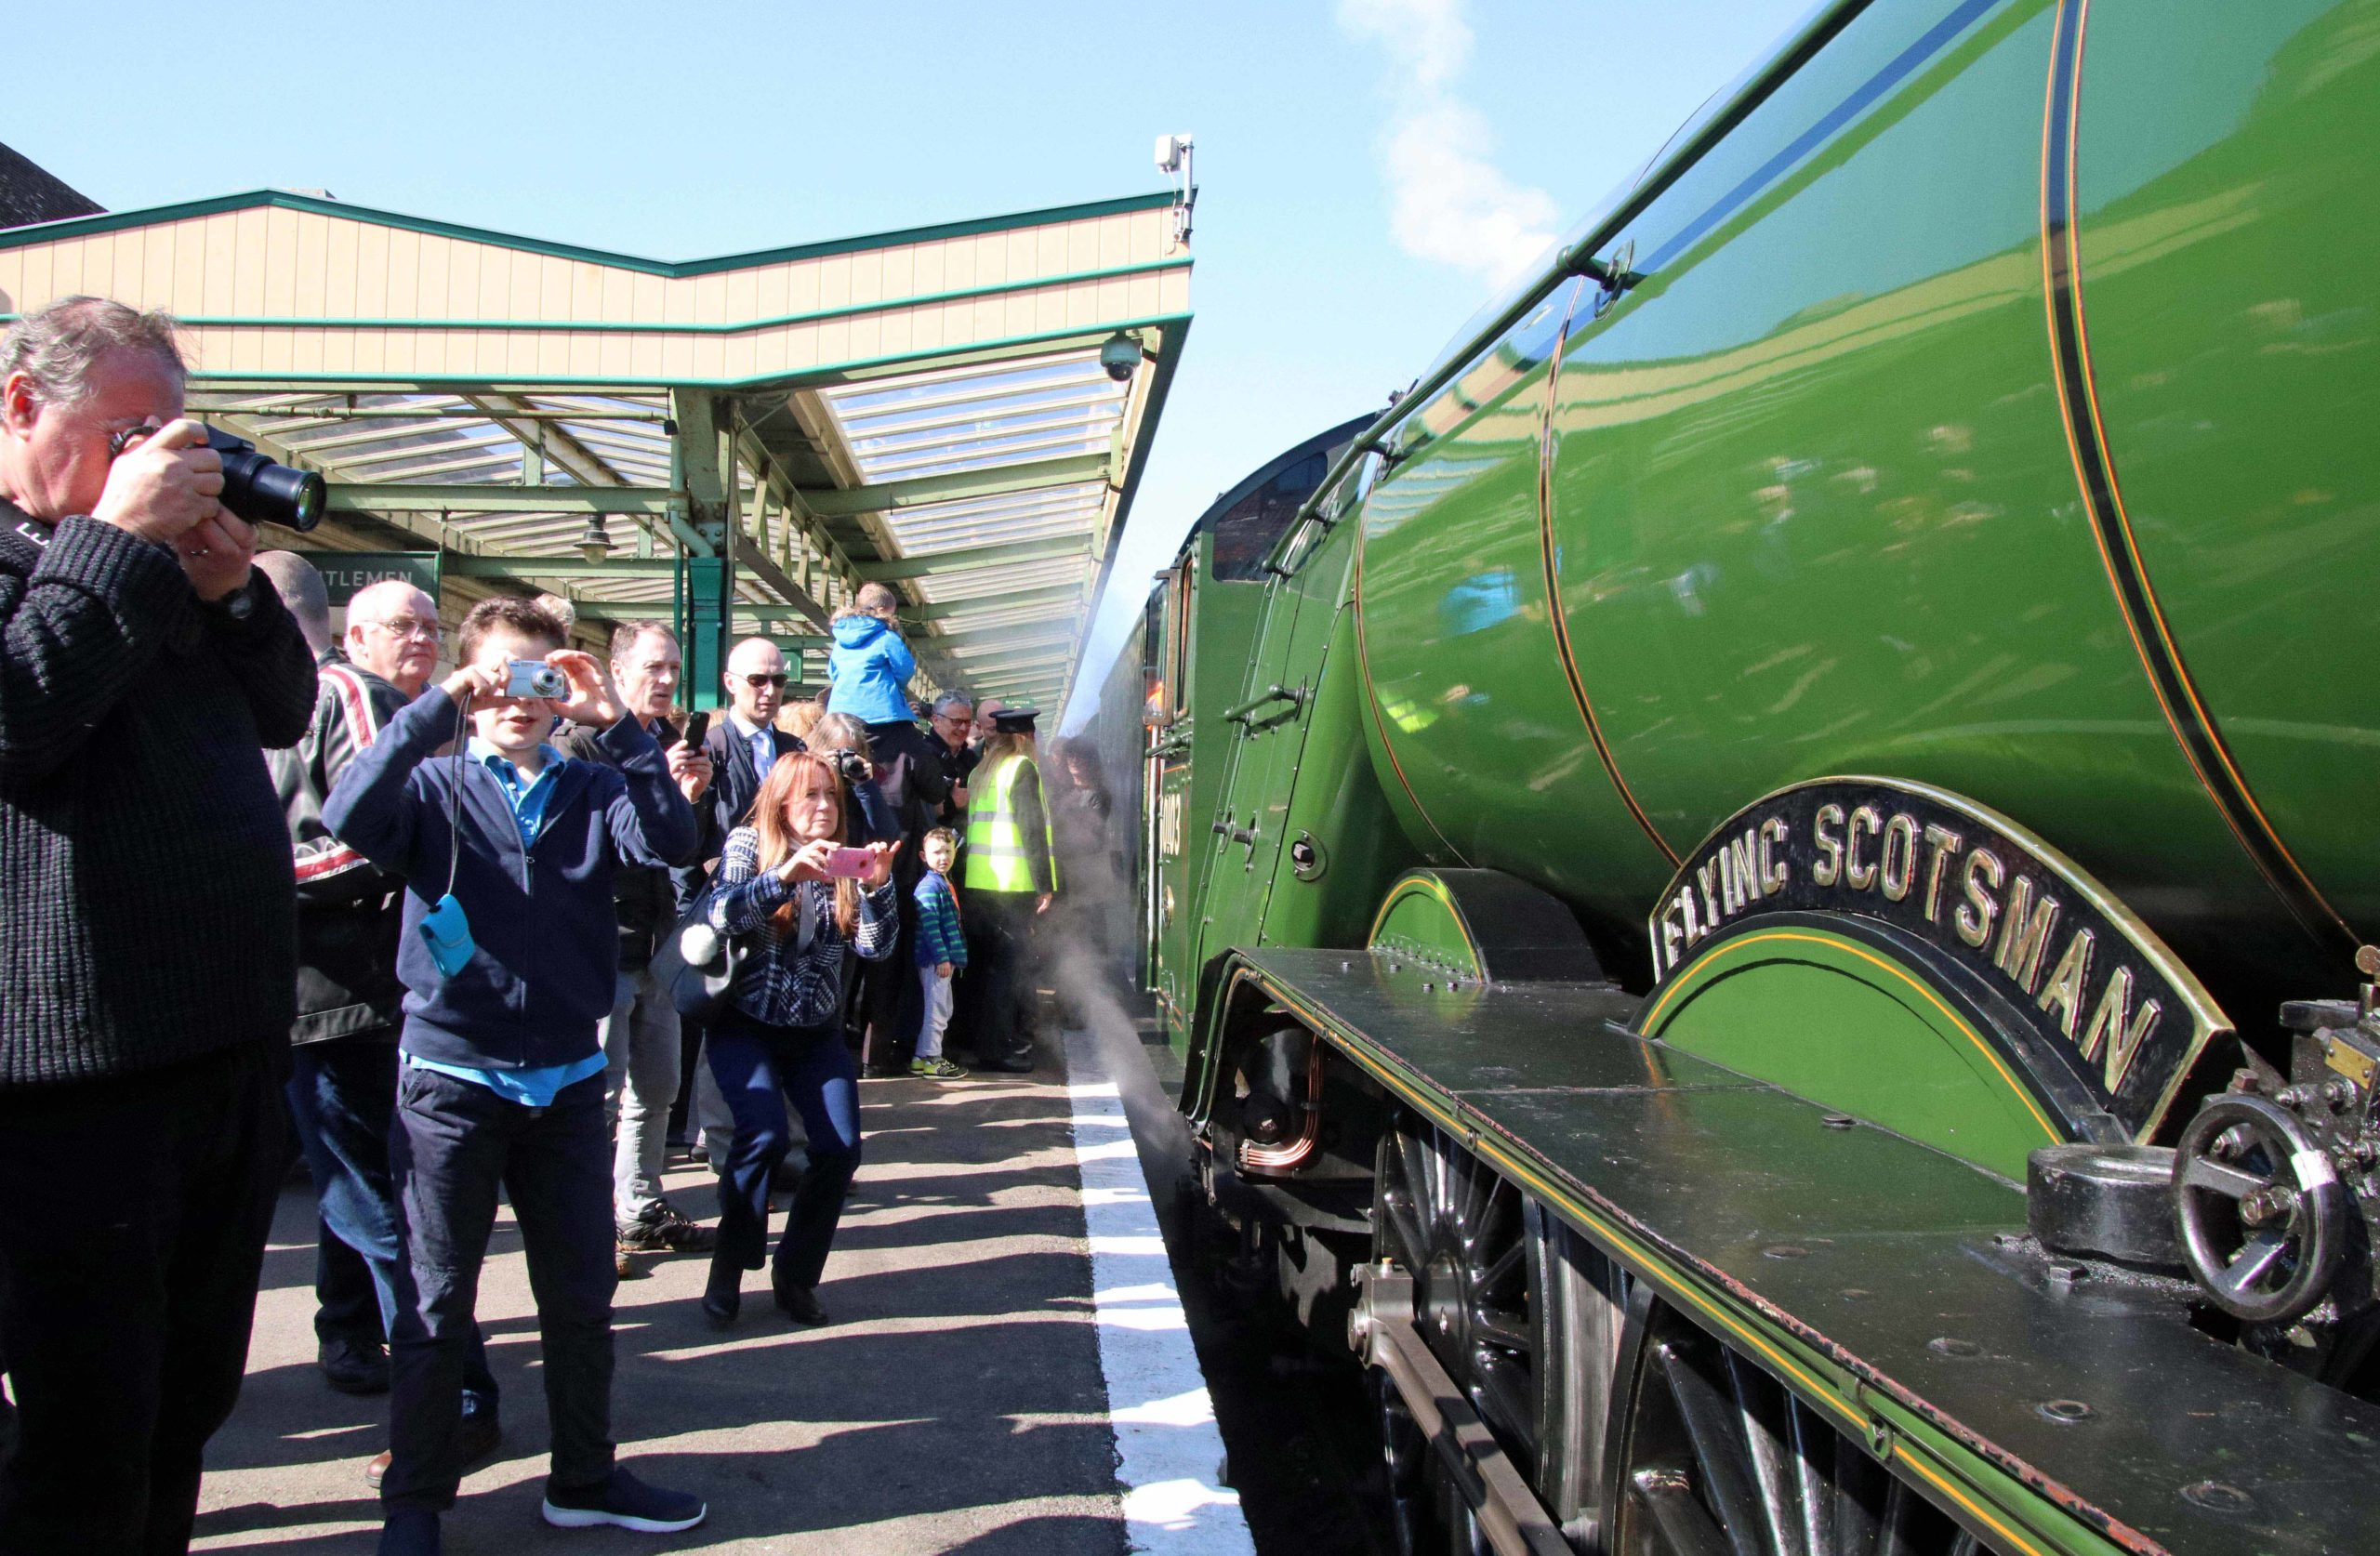 Flying Scotsman at Swanage Railway platform